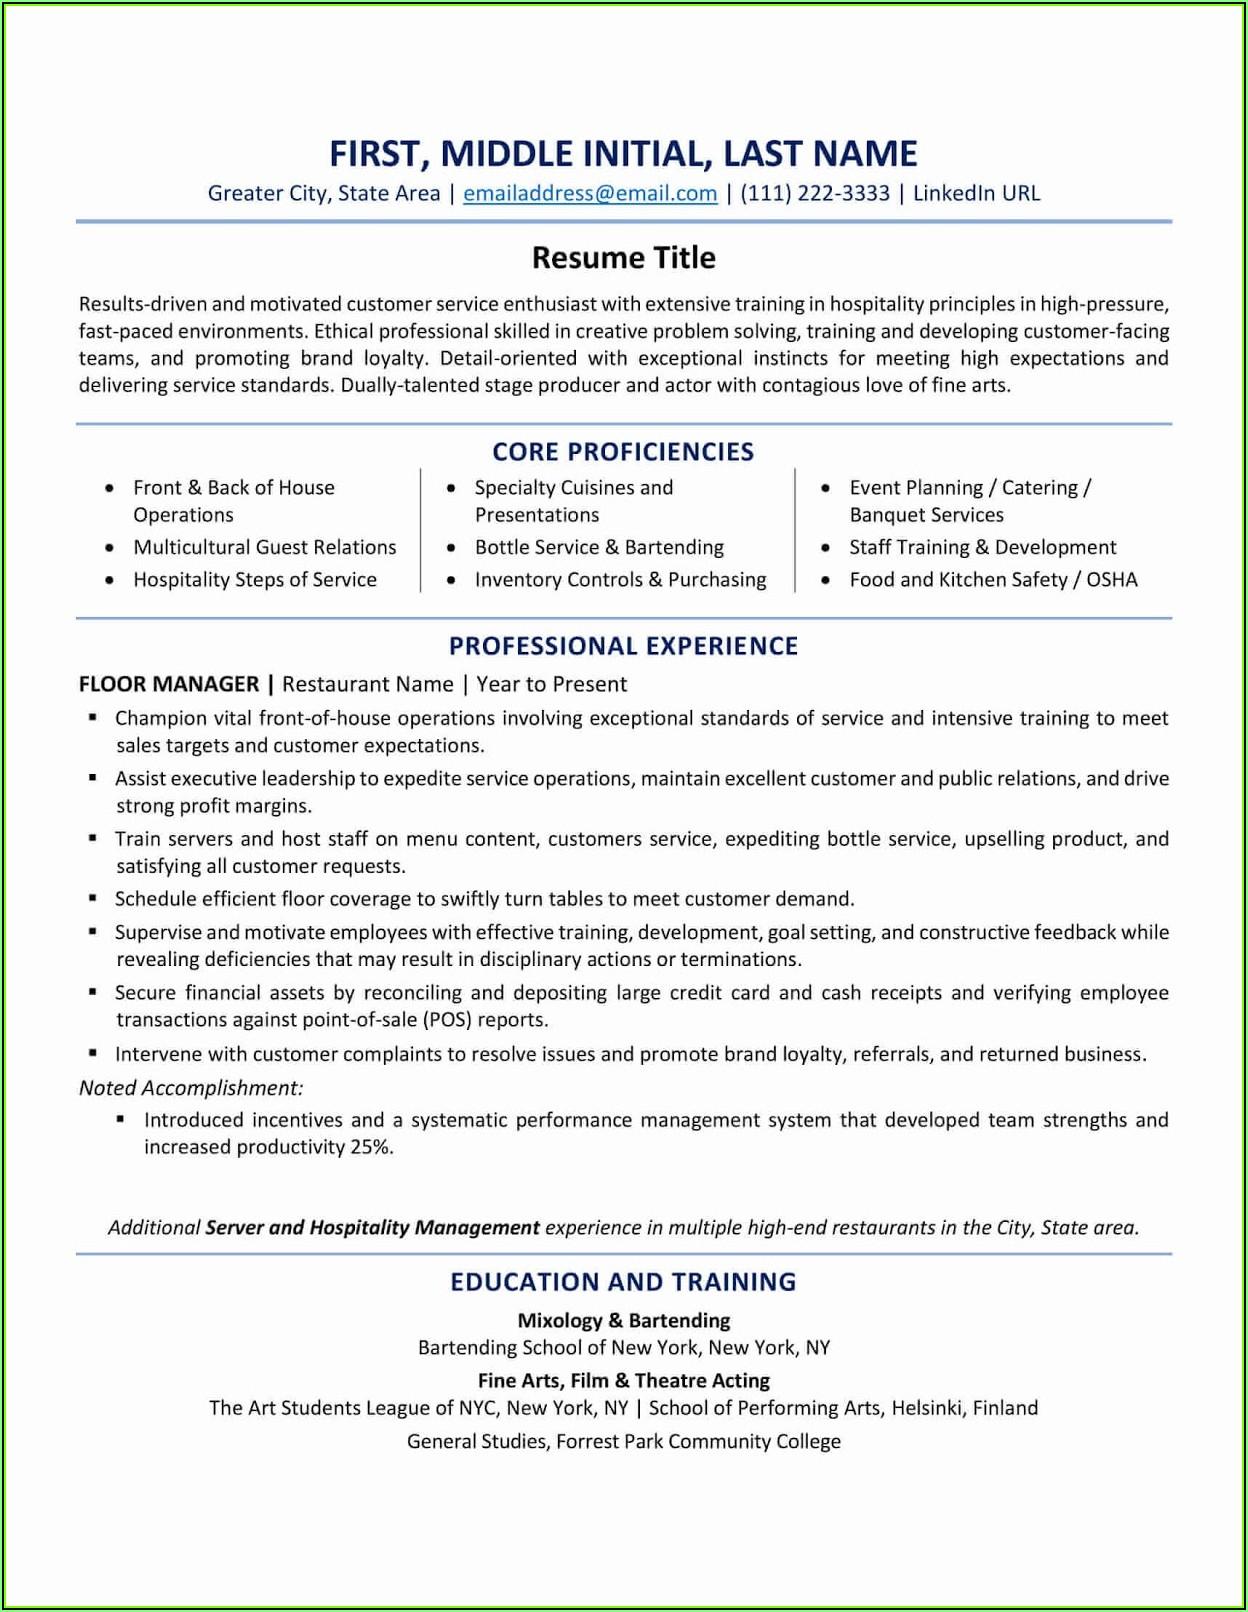 Skills Based Resume Template Canada